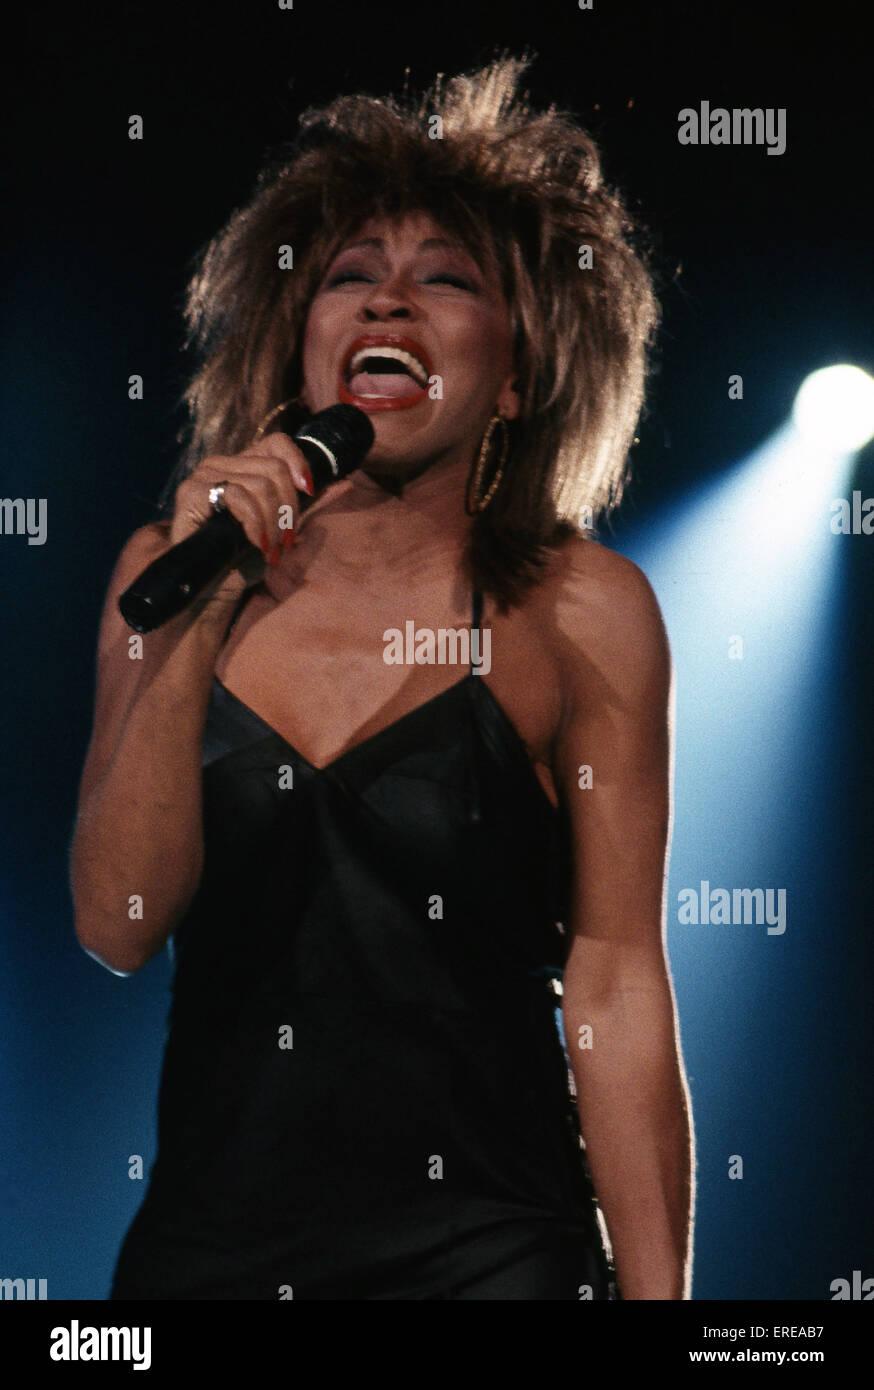 Tina Turner, singing, Los Angeles, USA. American singer, dancer and actress. B November 26, 1939 -. - Stock Image